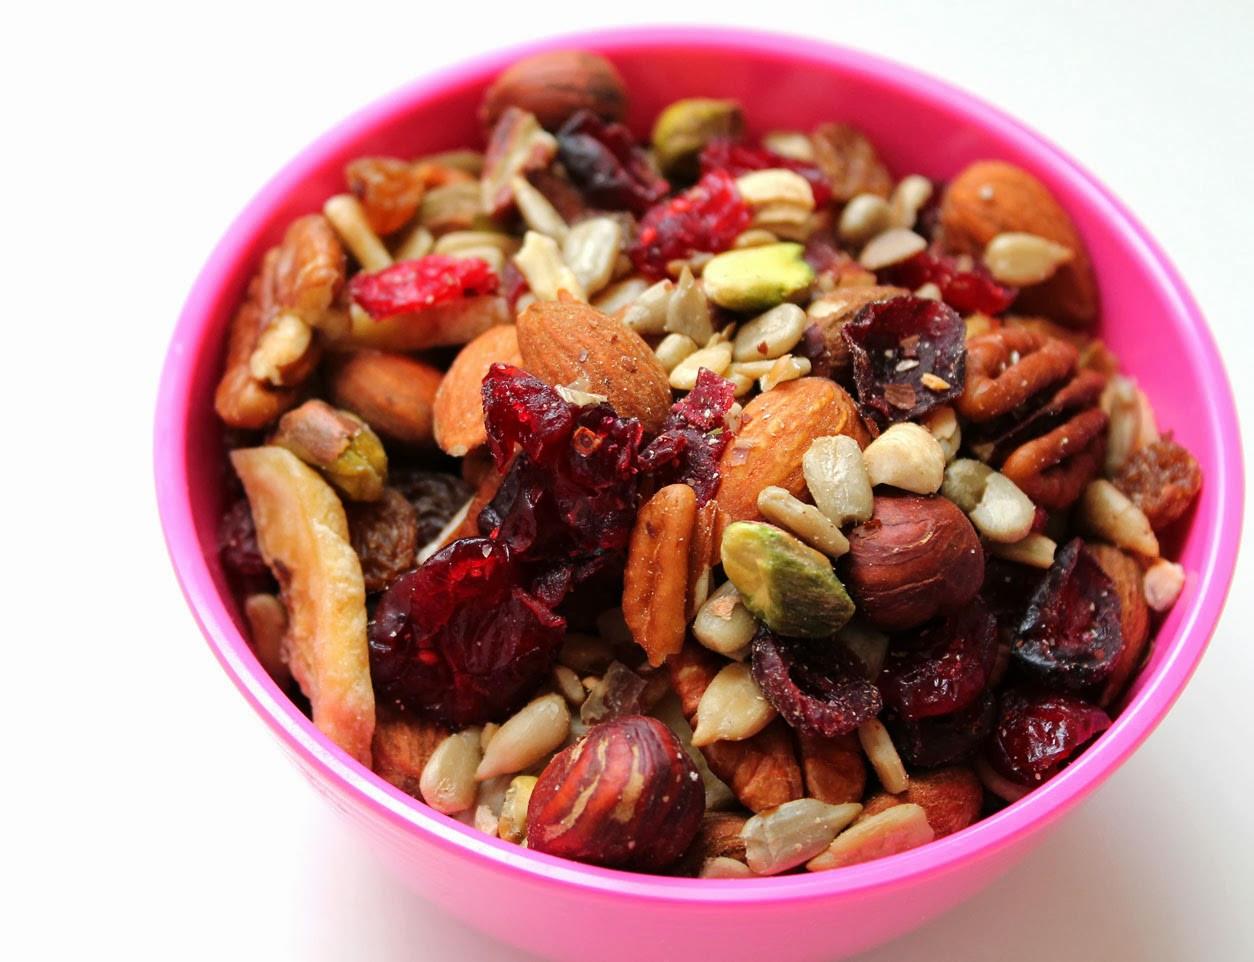 Healthy Vegan Snacks  The Dietetic Degustation 13 healthy snack ideas